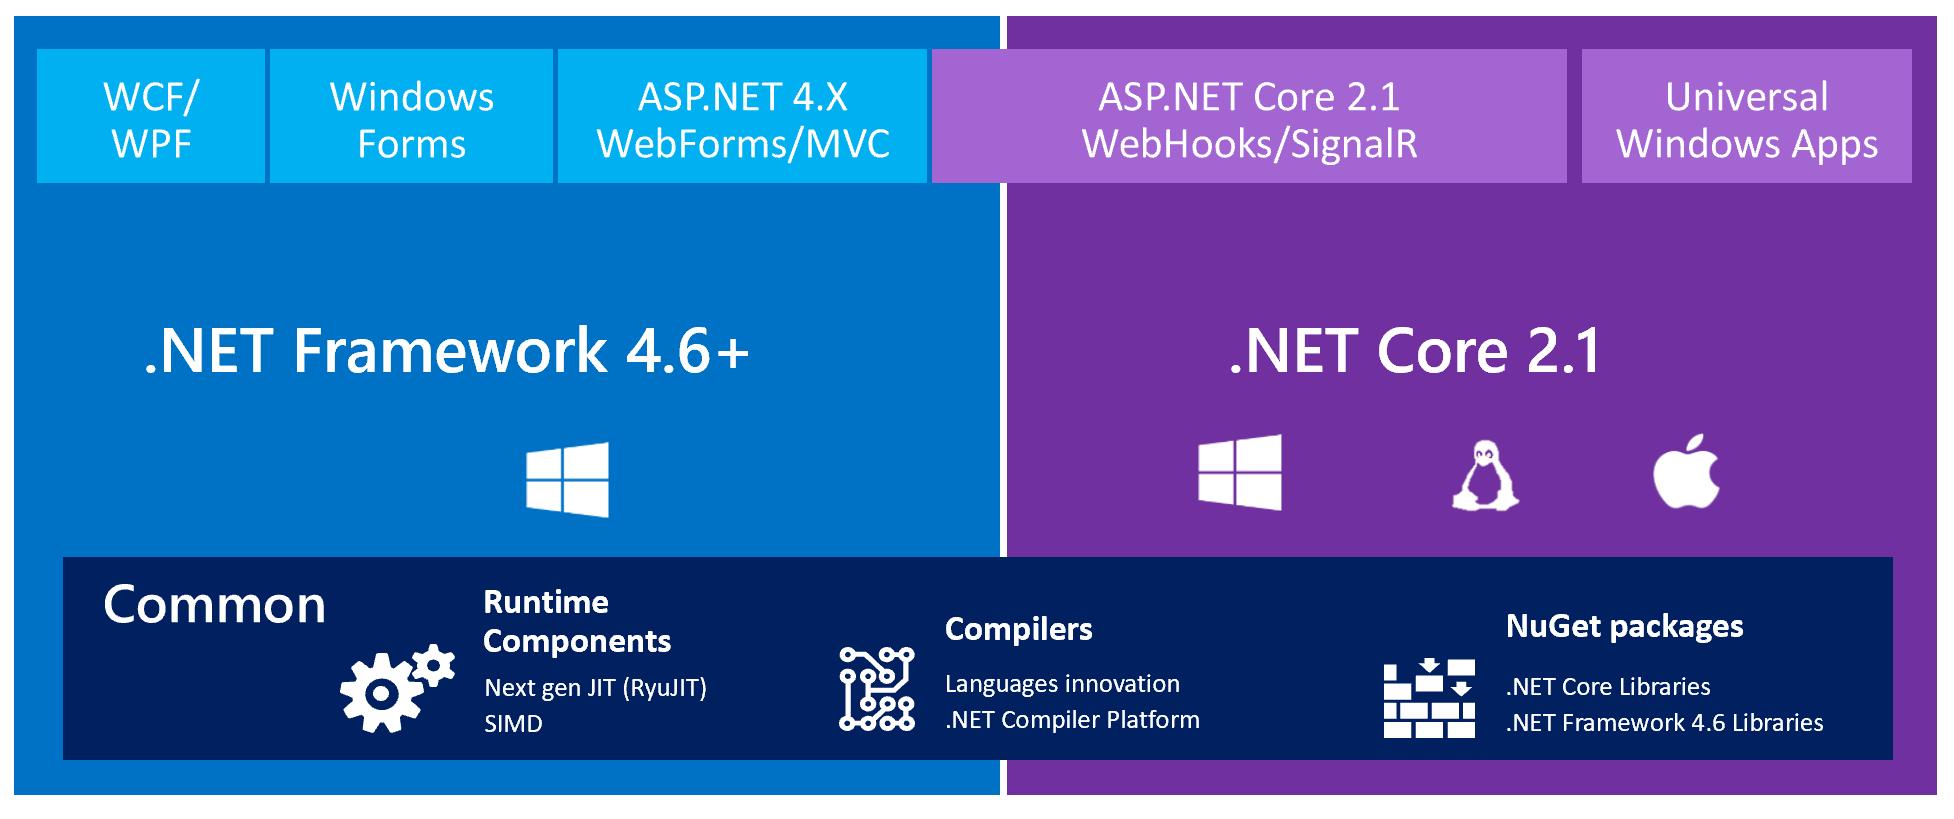 ASP.NET Core 2.1 Architecture